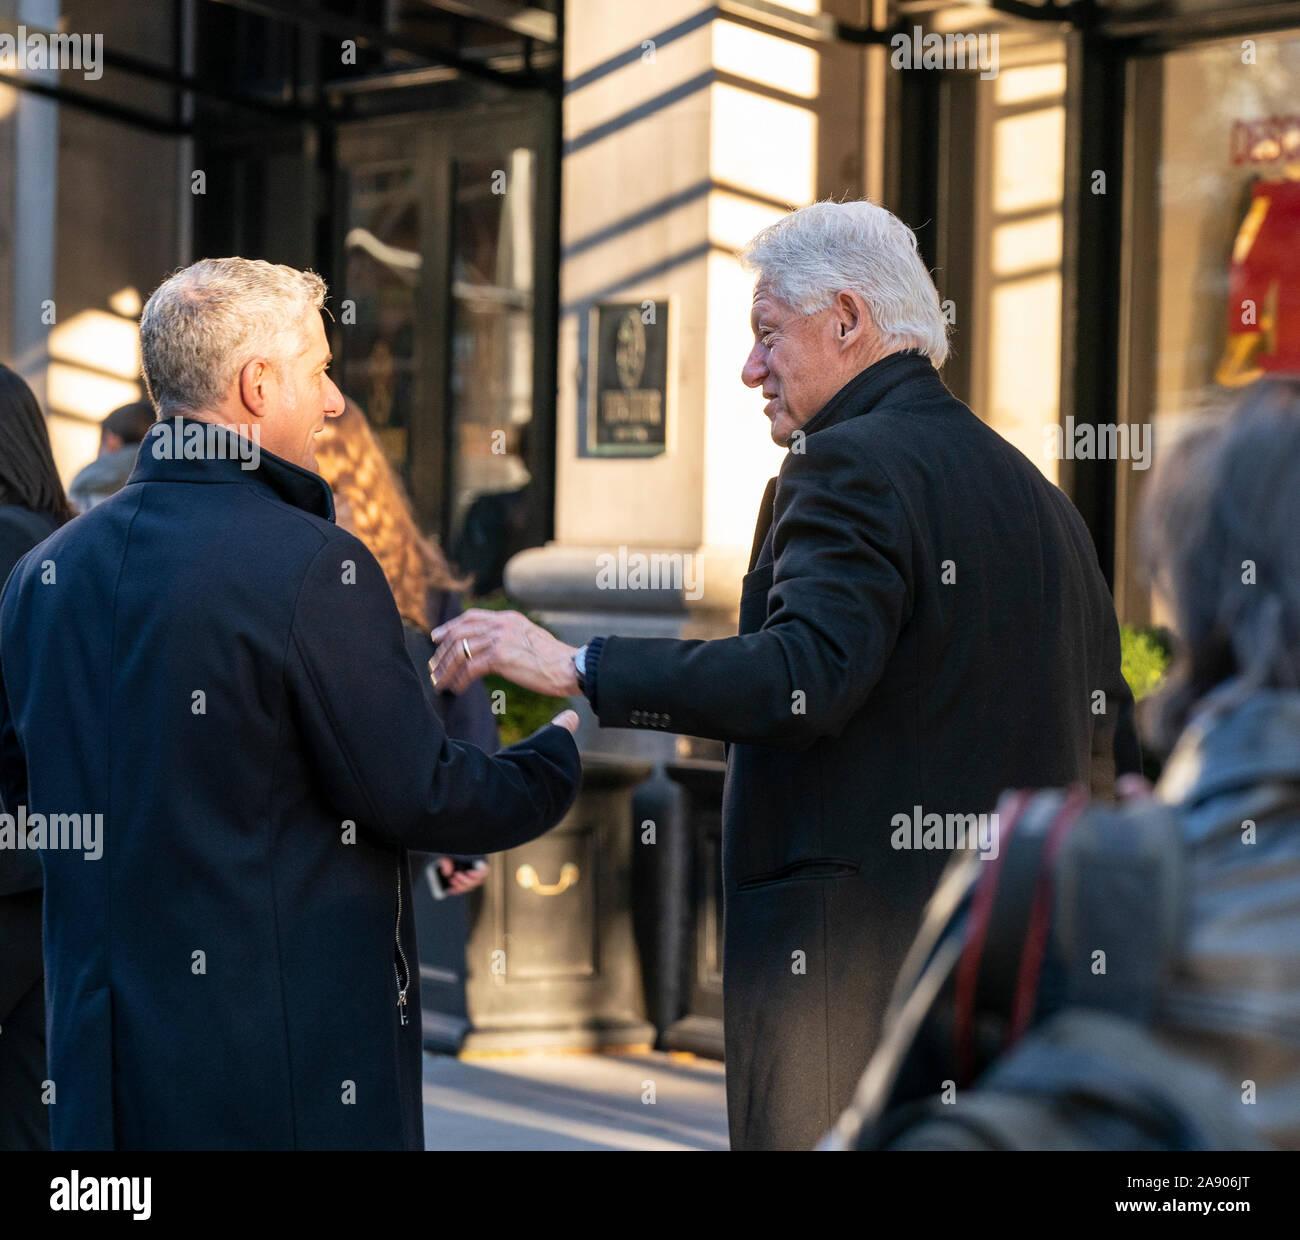 New York, United States. 11th Nov, 2019. Former US President Bill Clinton arrives for breakfast at Blackbarn restaurant. (Photo by Lev Radin/Pacific Press) Credit: Pacific Press Agency/Alamy Live News Stock Photo